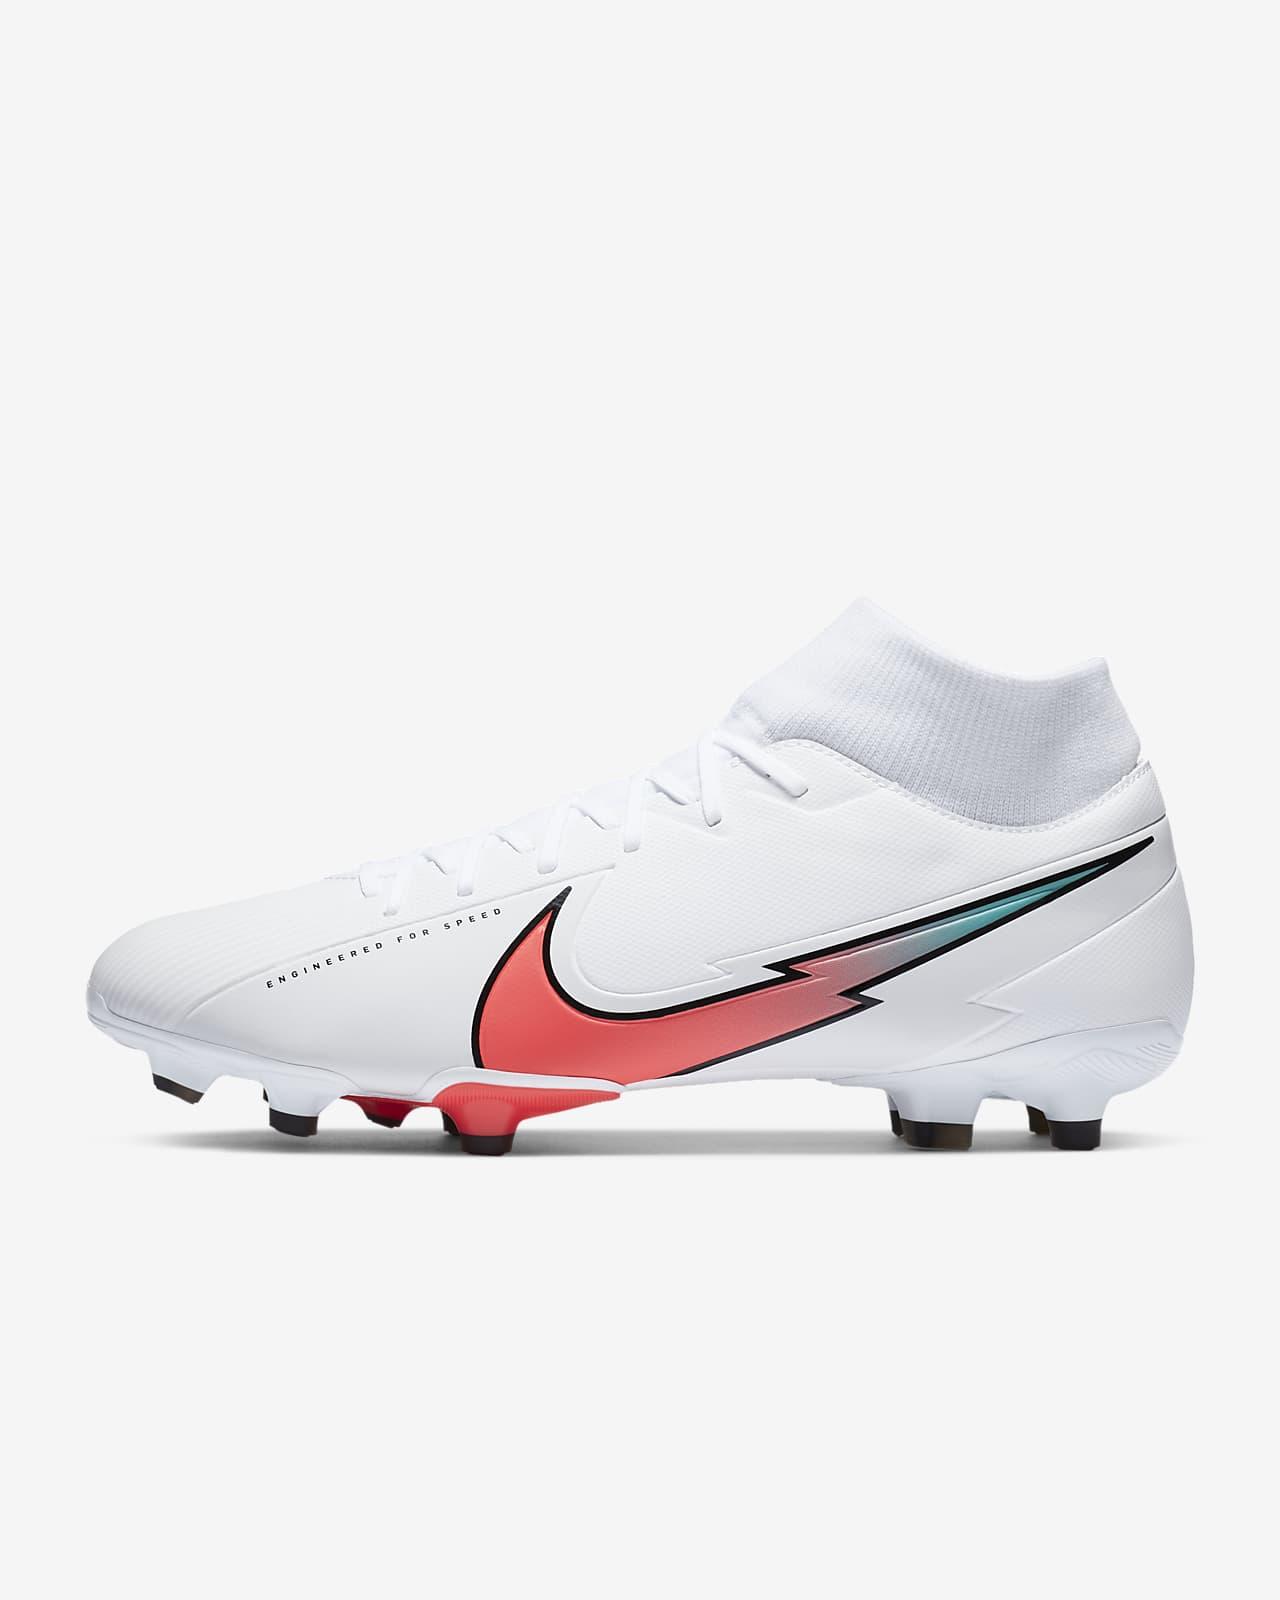 moneda Limitado bordillo  Nike Mercurial Superfly 7 Academy MG Multi-Ground Football Boot. Nike LU